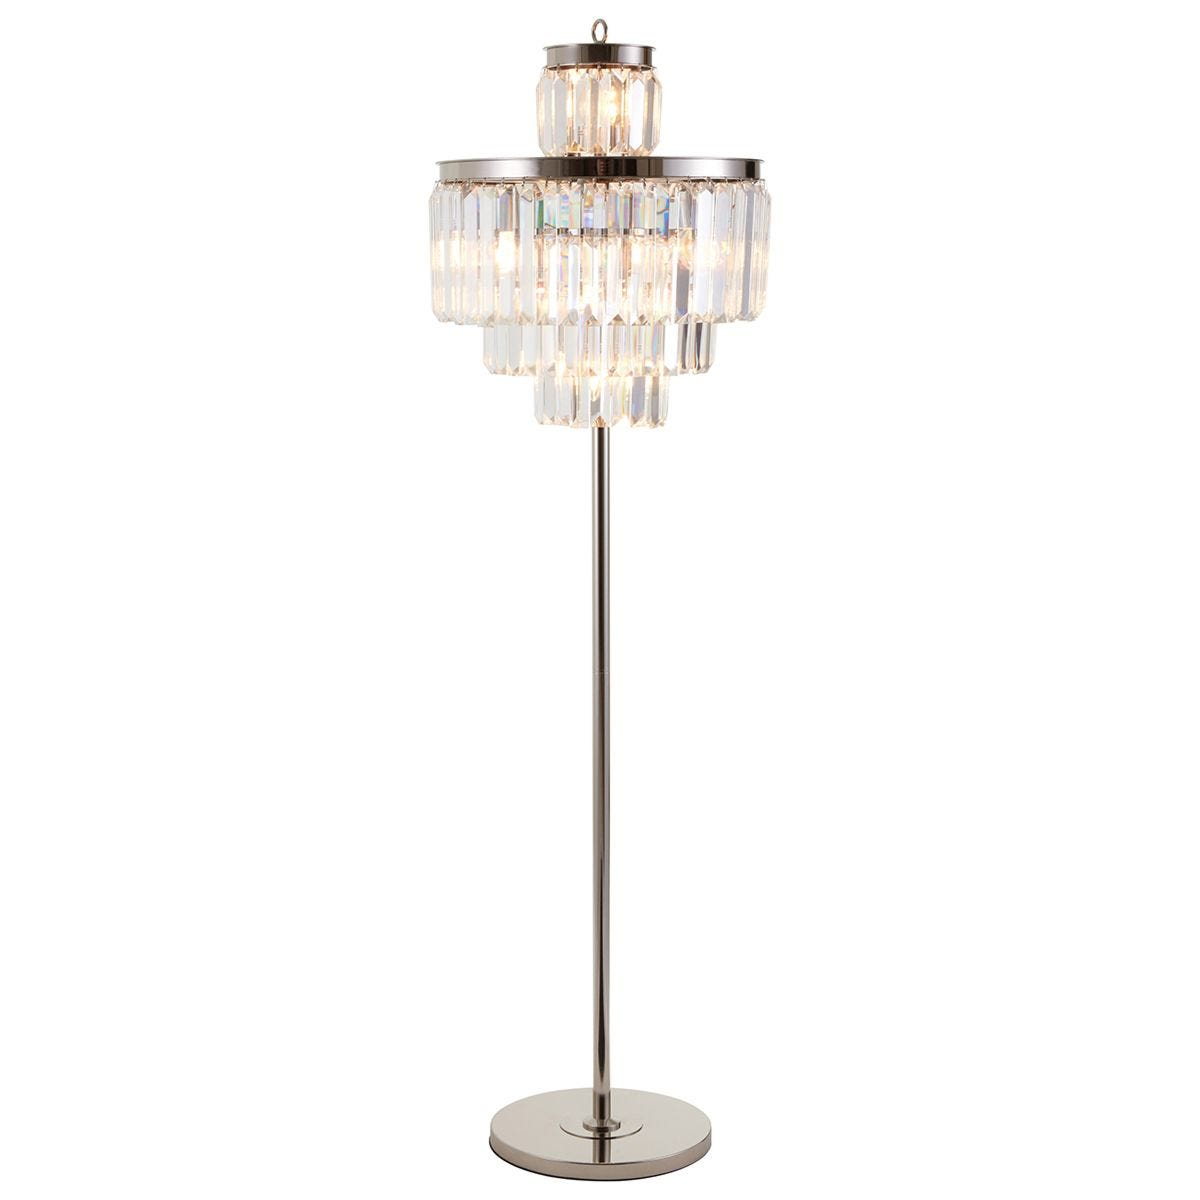 Premier Housewares Kensington Townhouse Pendant Floor Lamp in Chrome with Crystals - 10 Bulbs